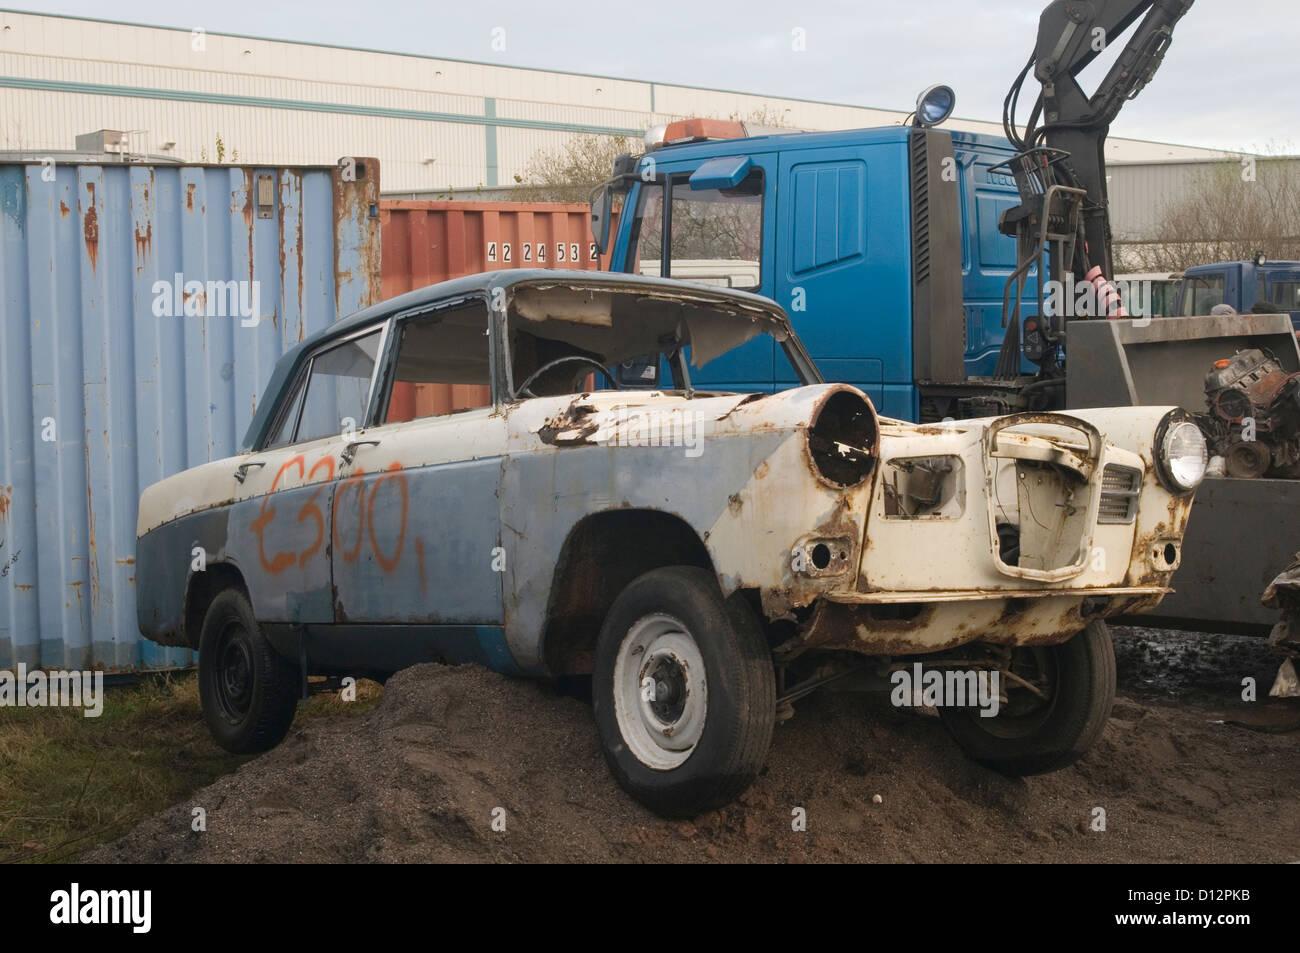 Scrap Classic Cars Stock Photos & Scrap Classic Cars Stock Images ...